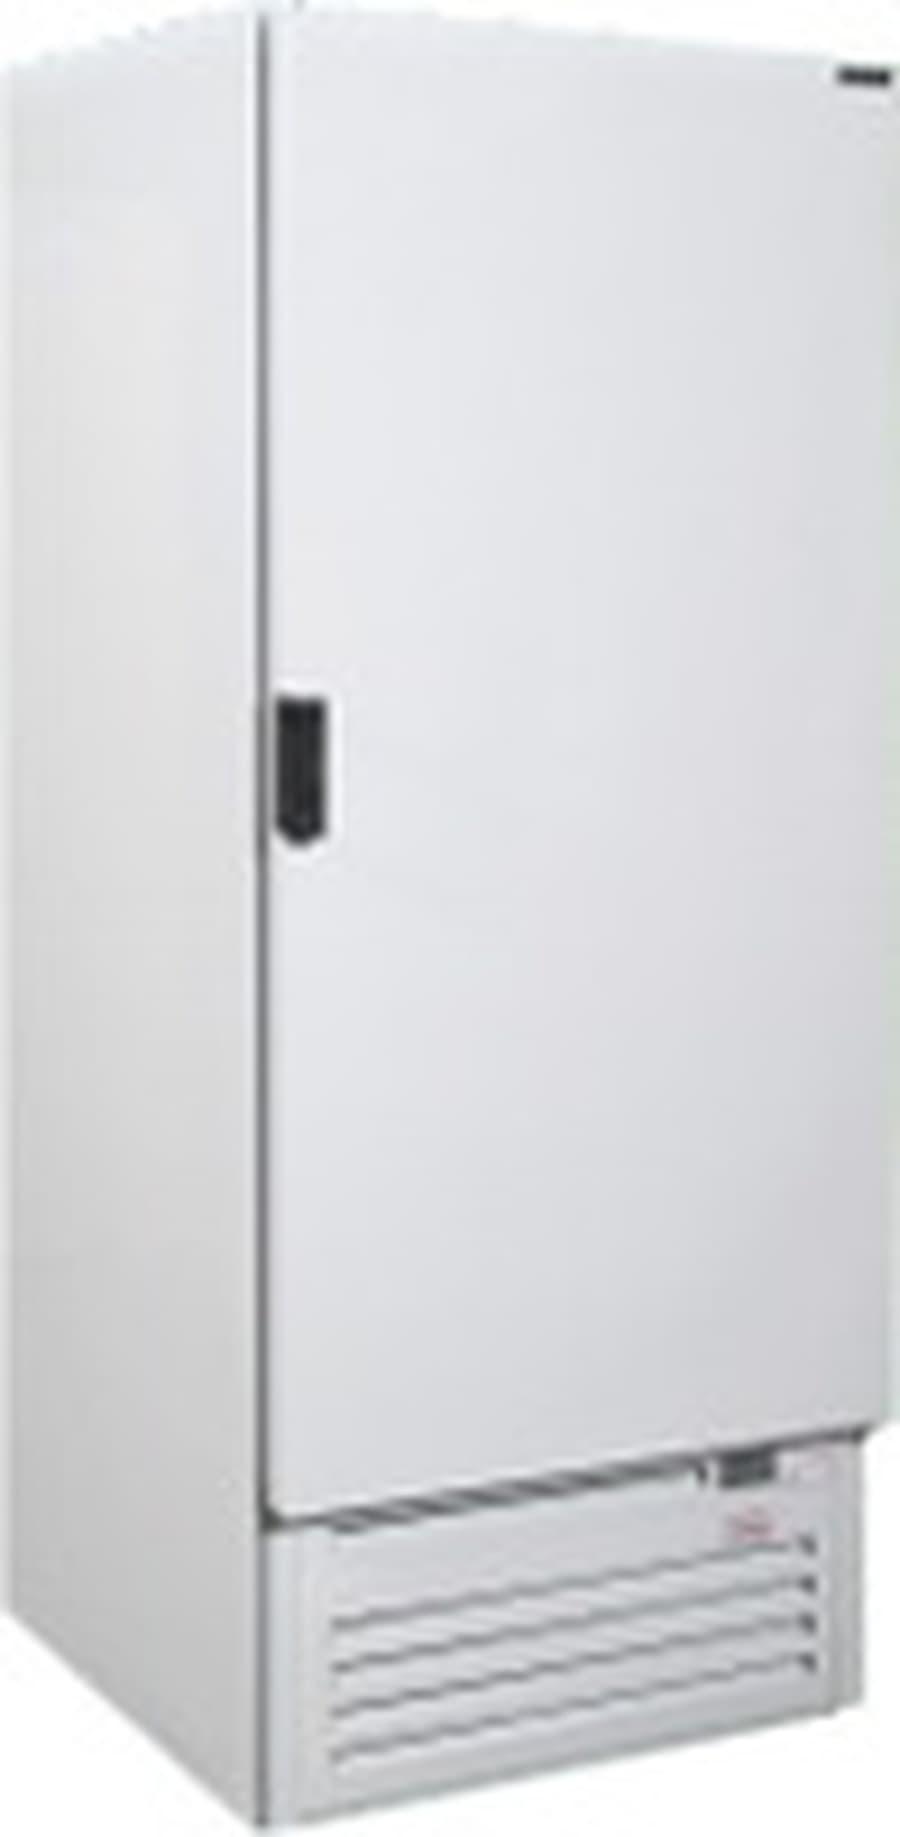 Шкаф холодильный ШВУП1ТУ - 0,75М